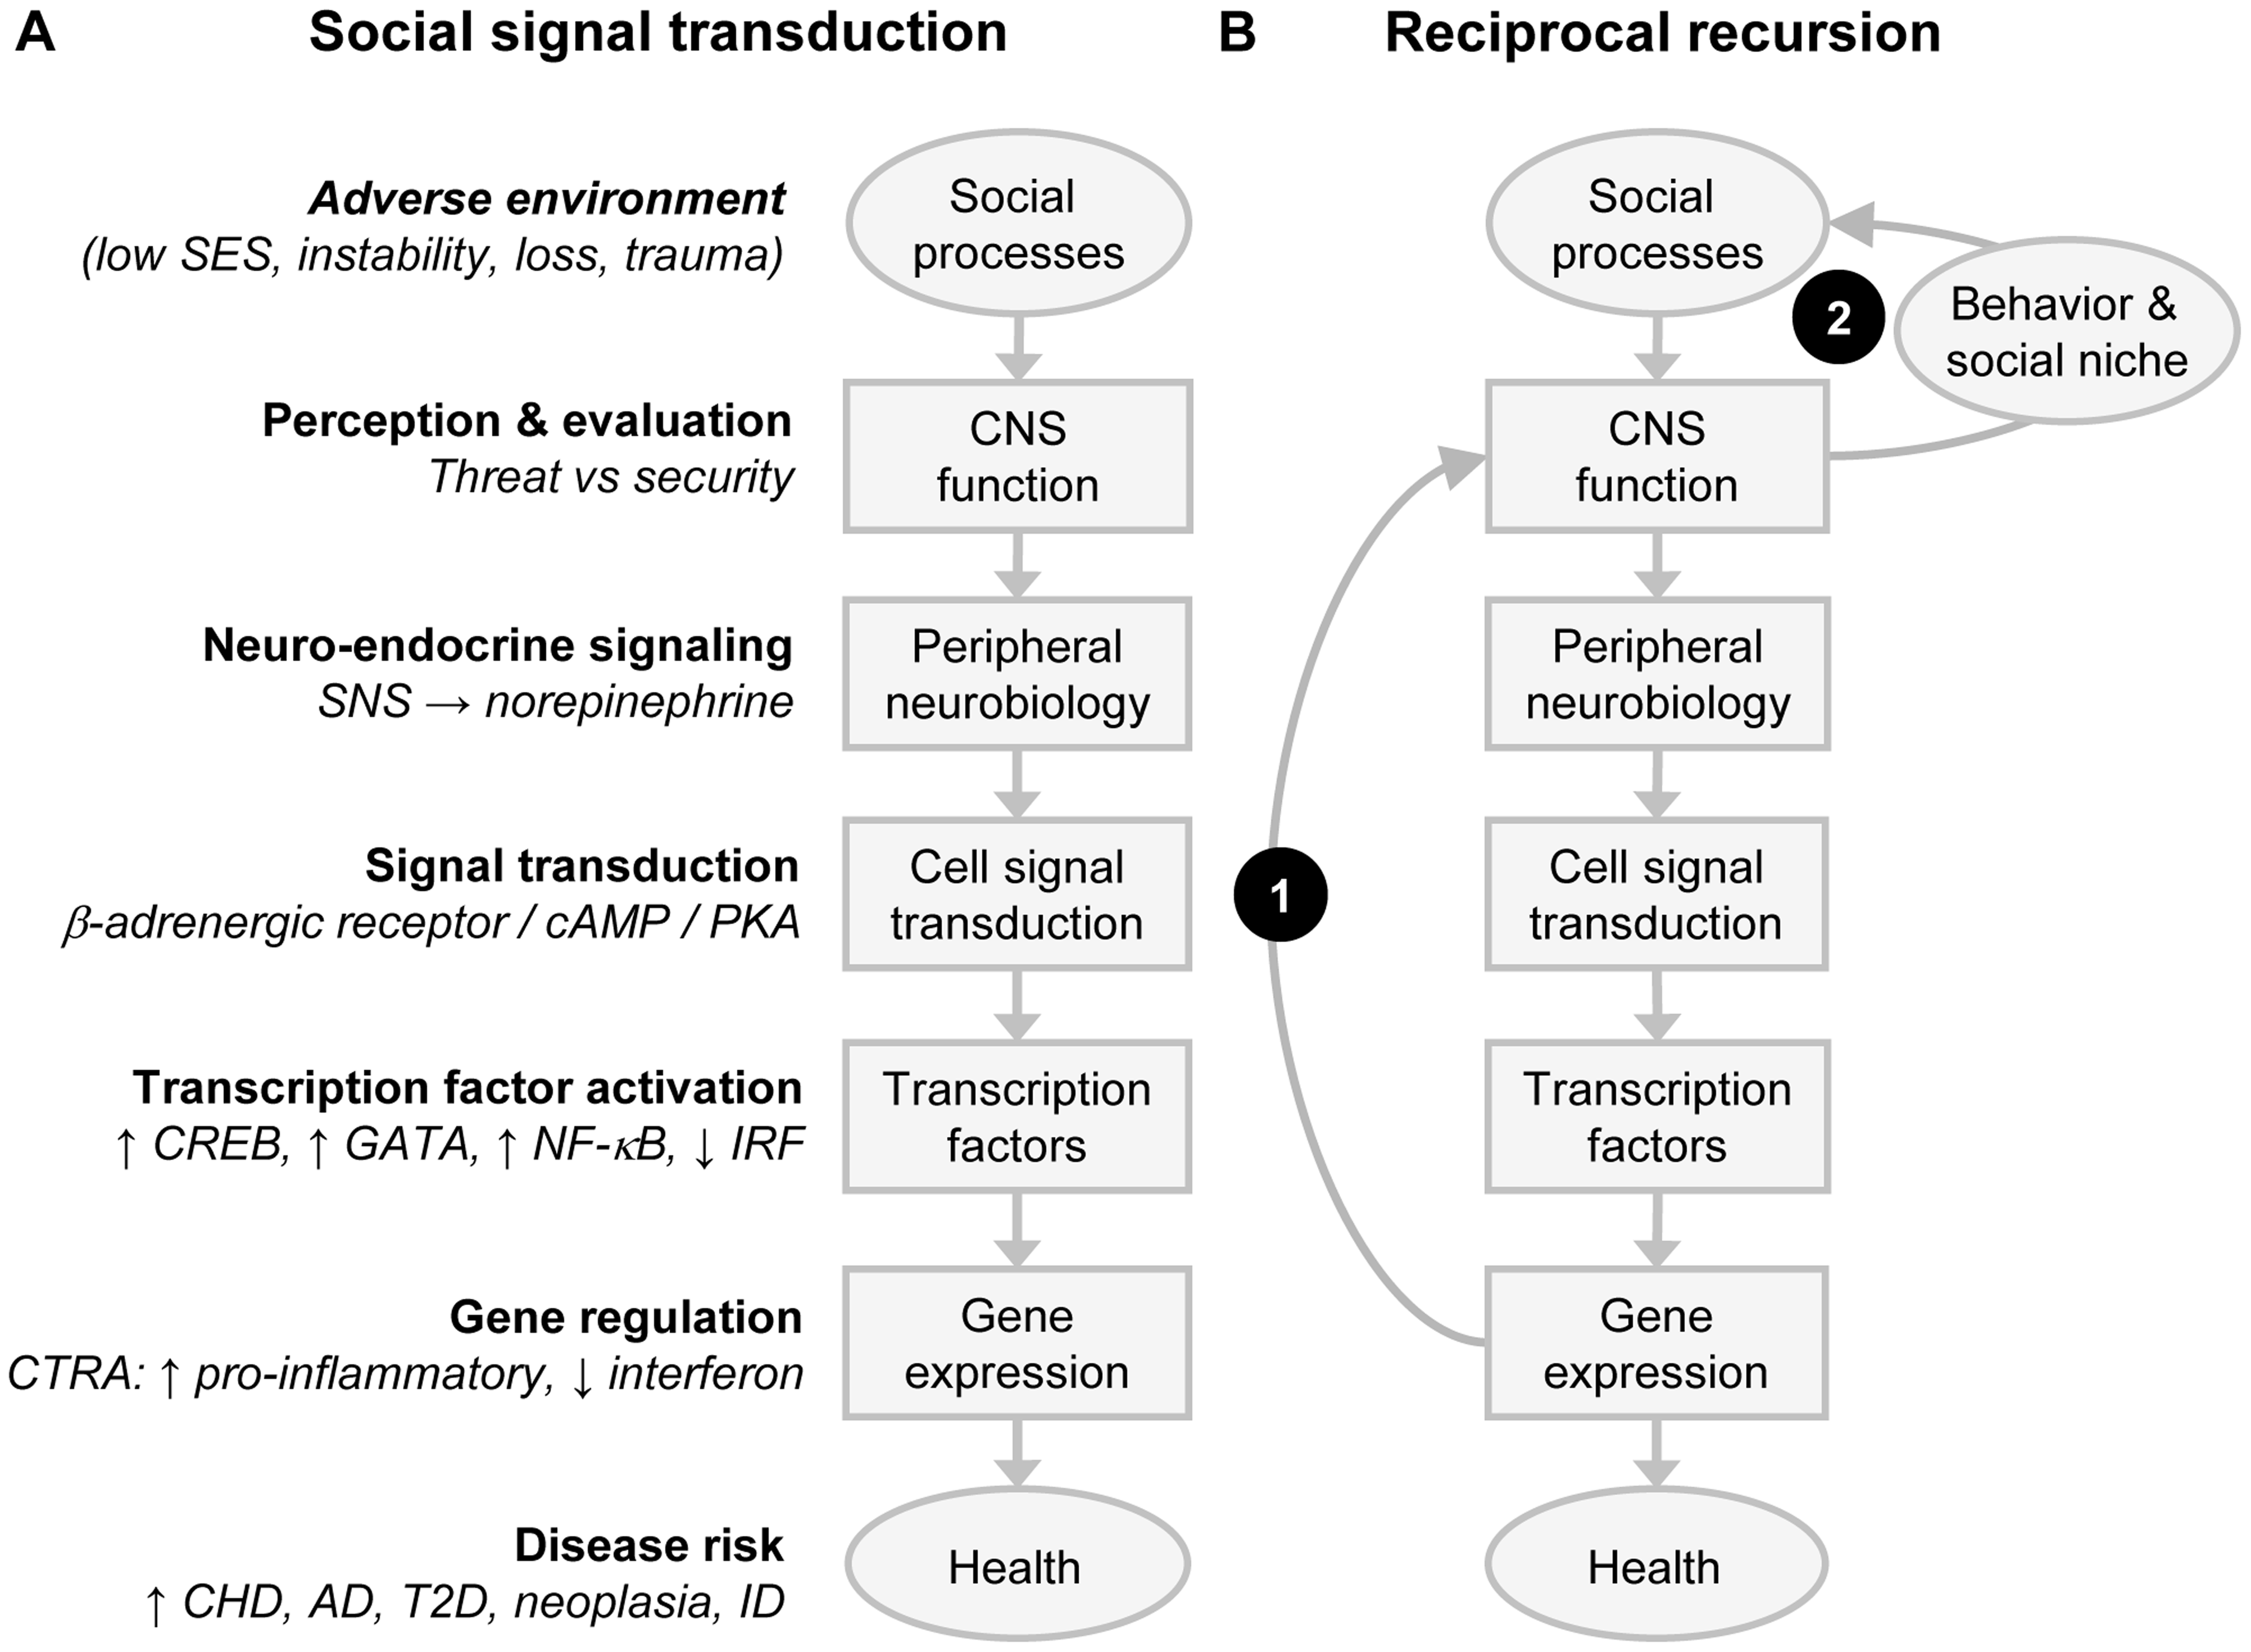 Social signal transduction and recursive network genomics.